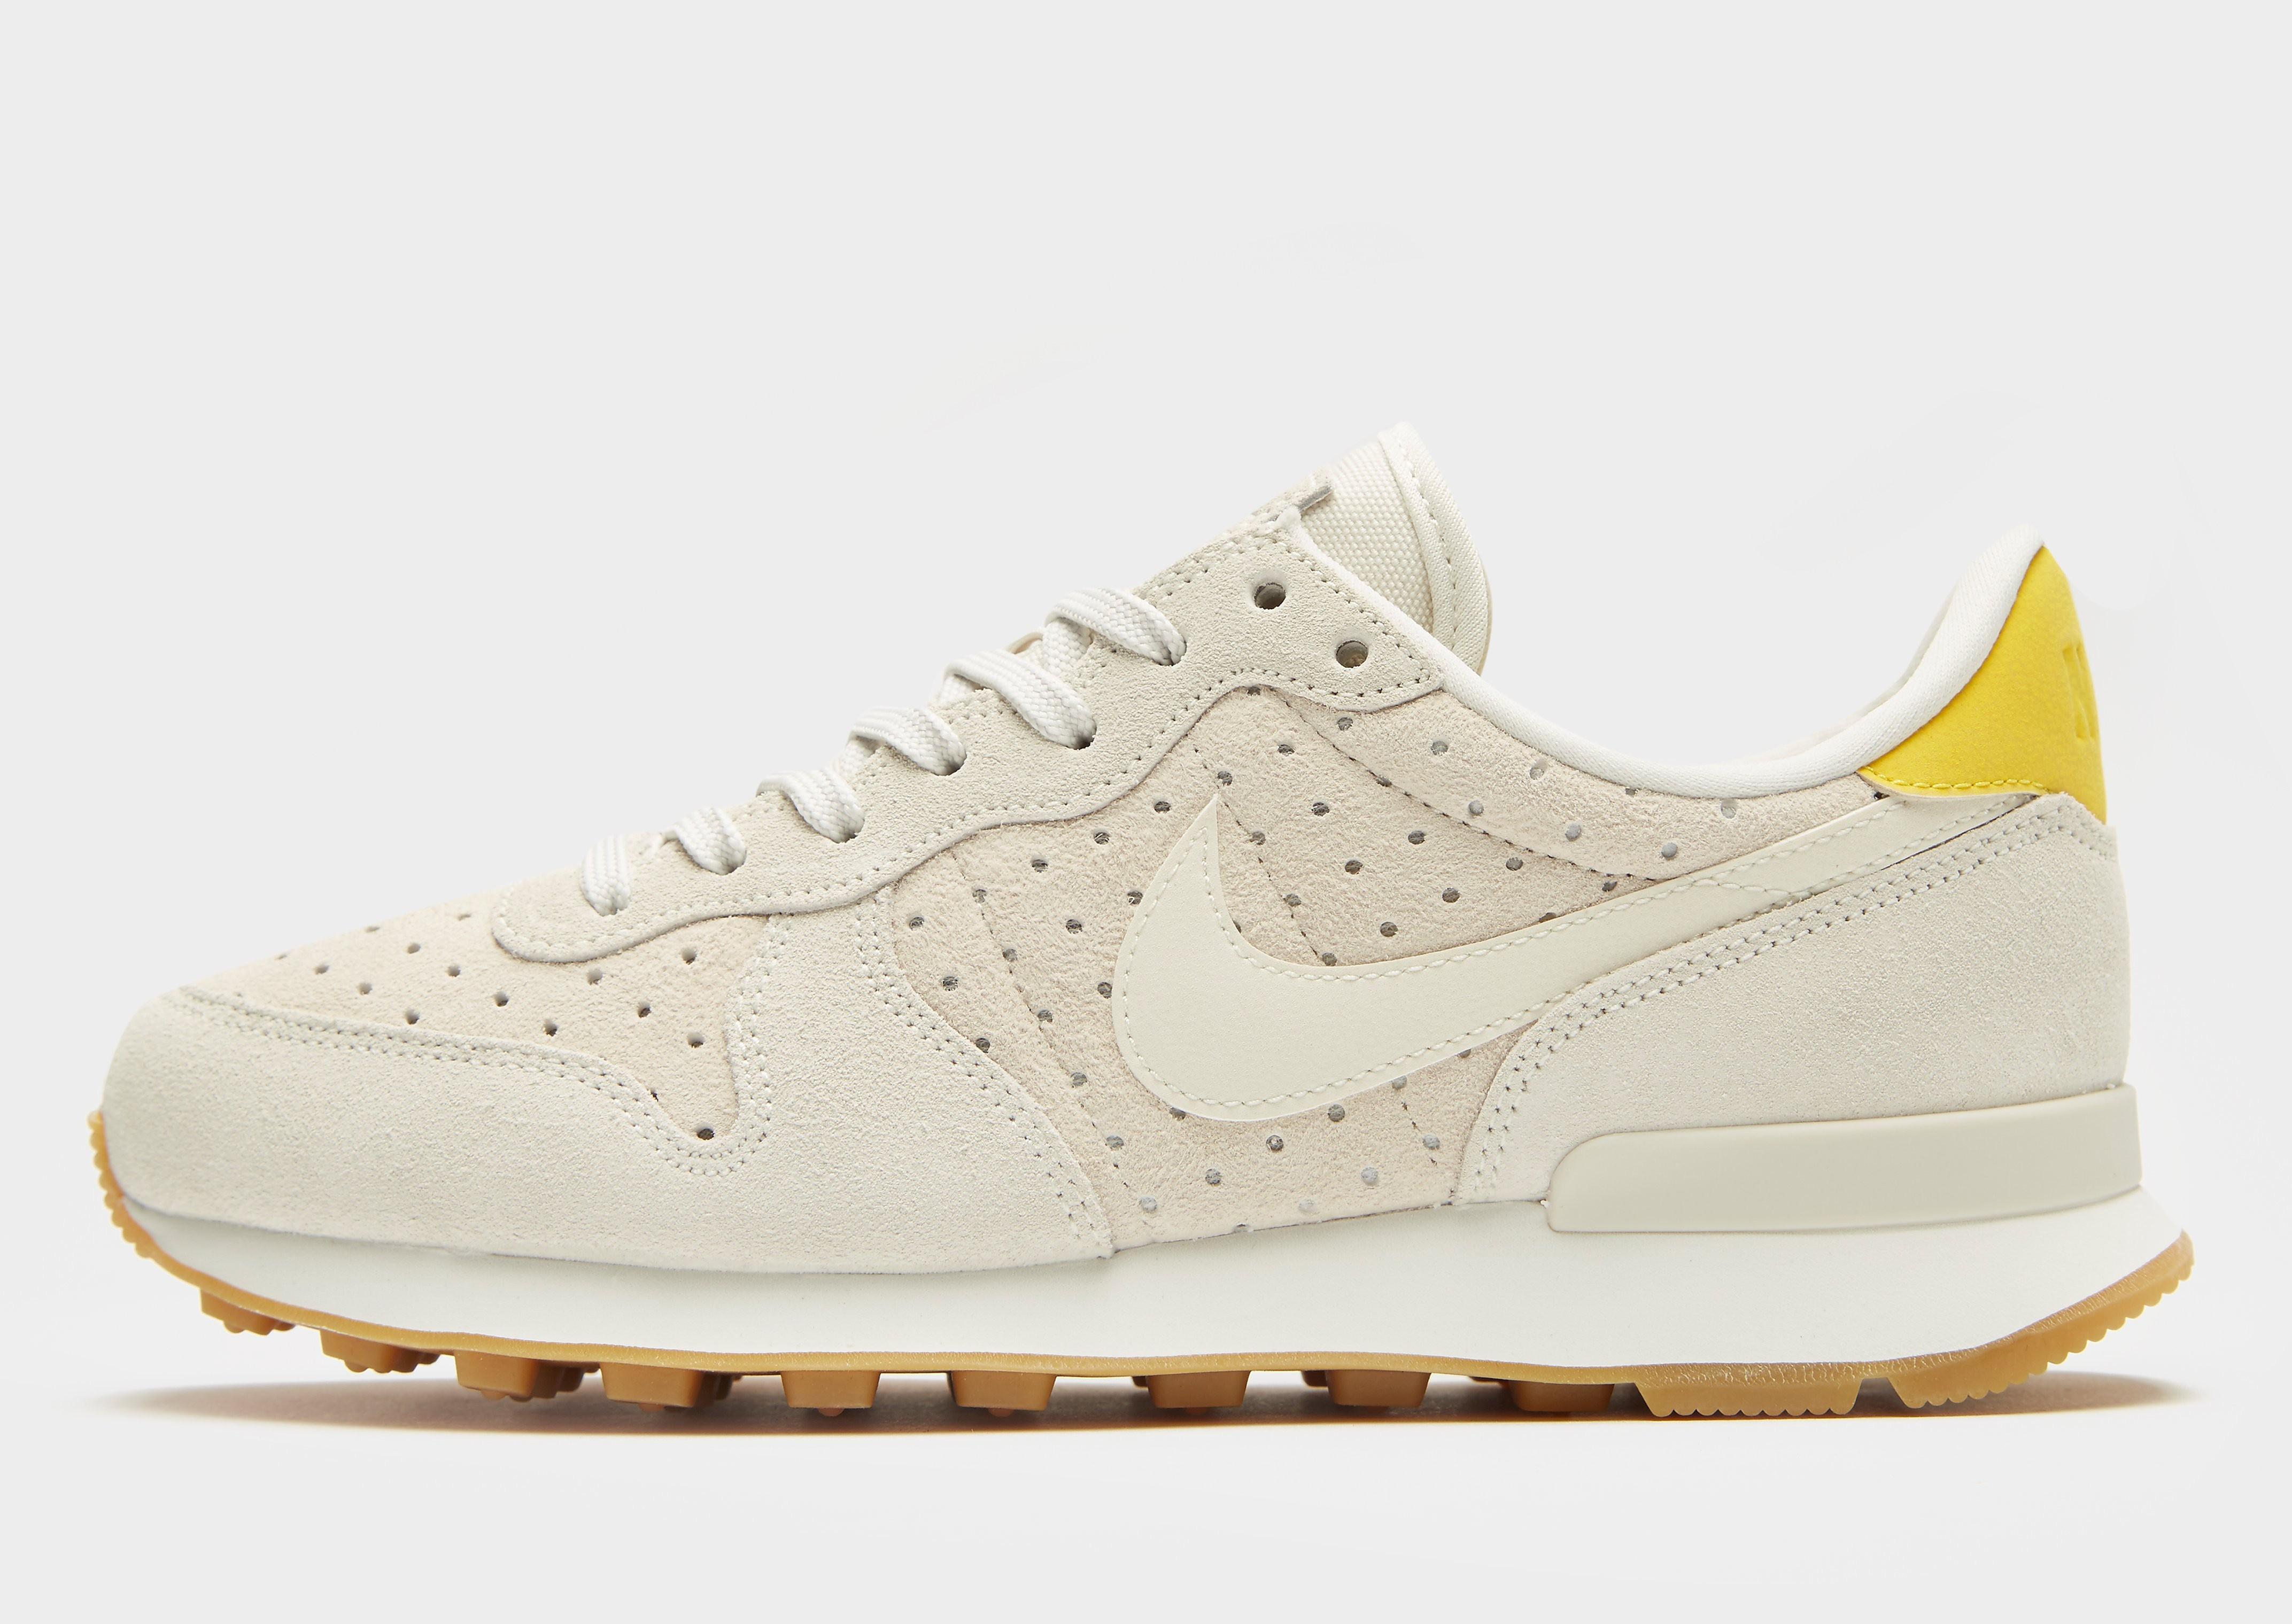 Nike Internationalist Leather Dames